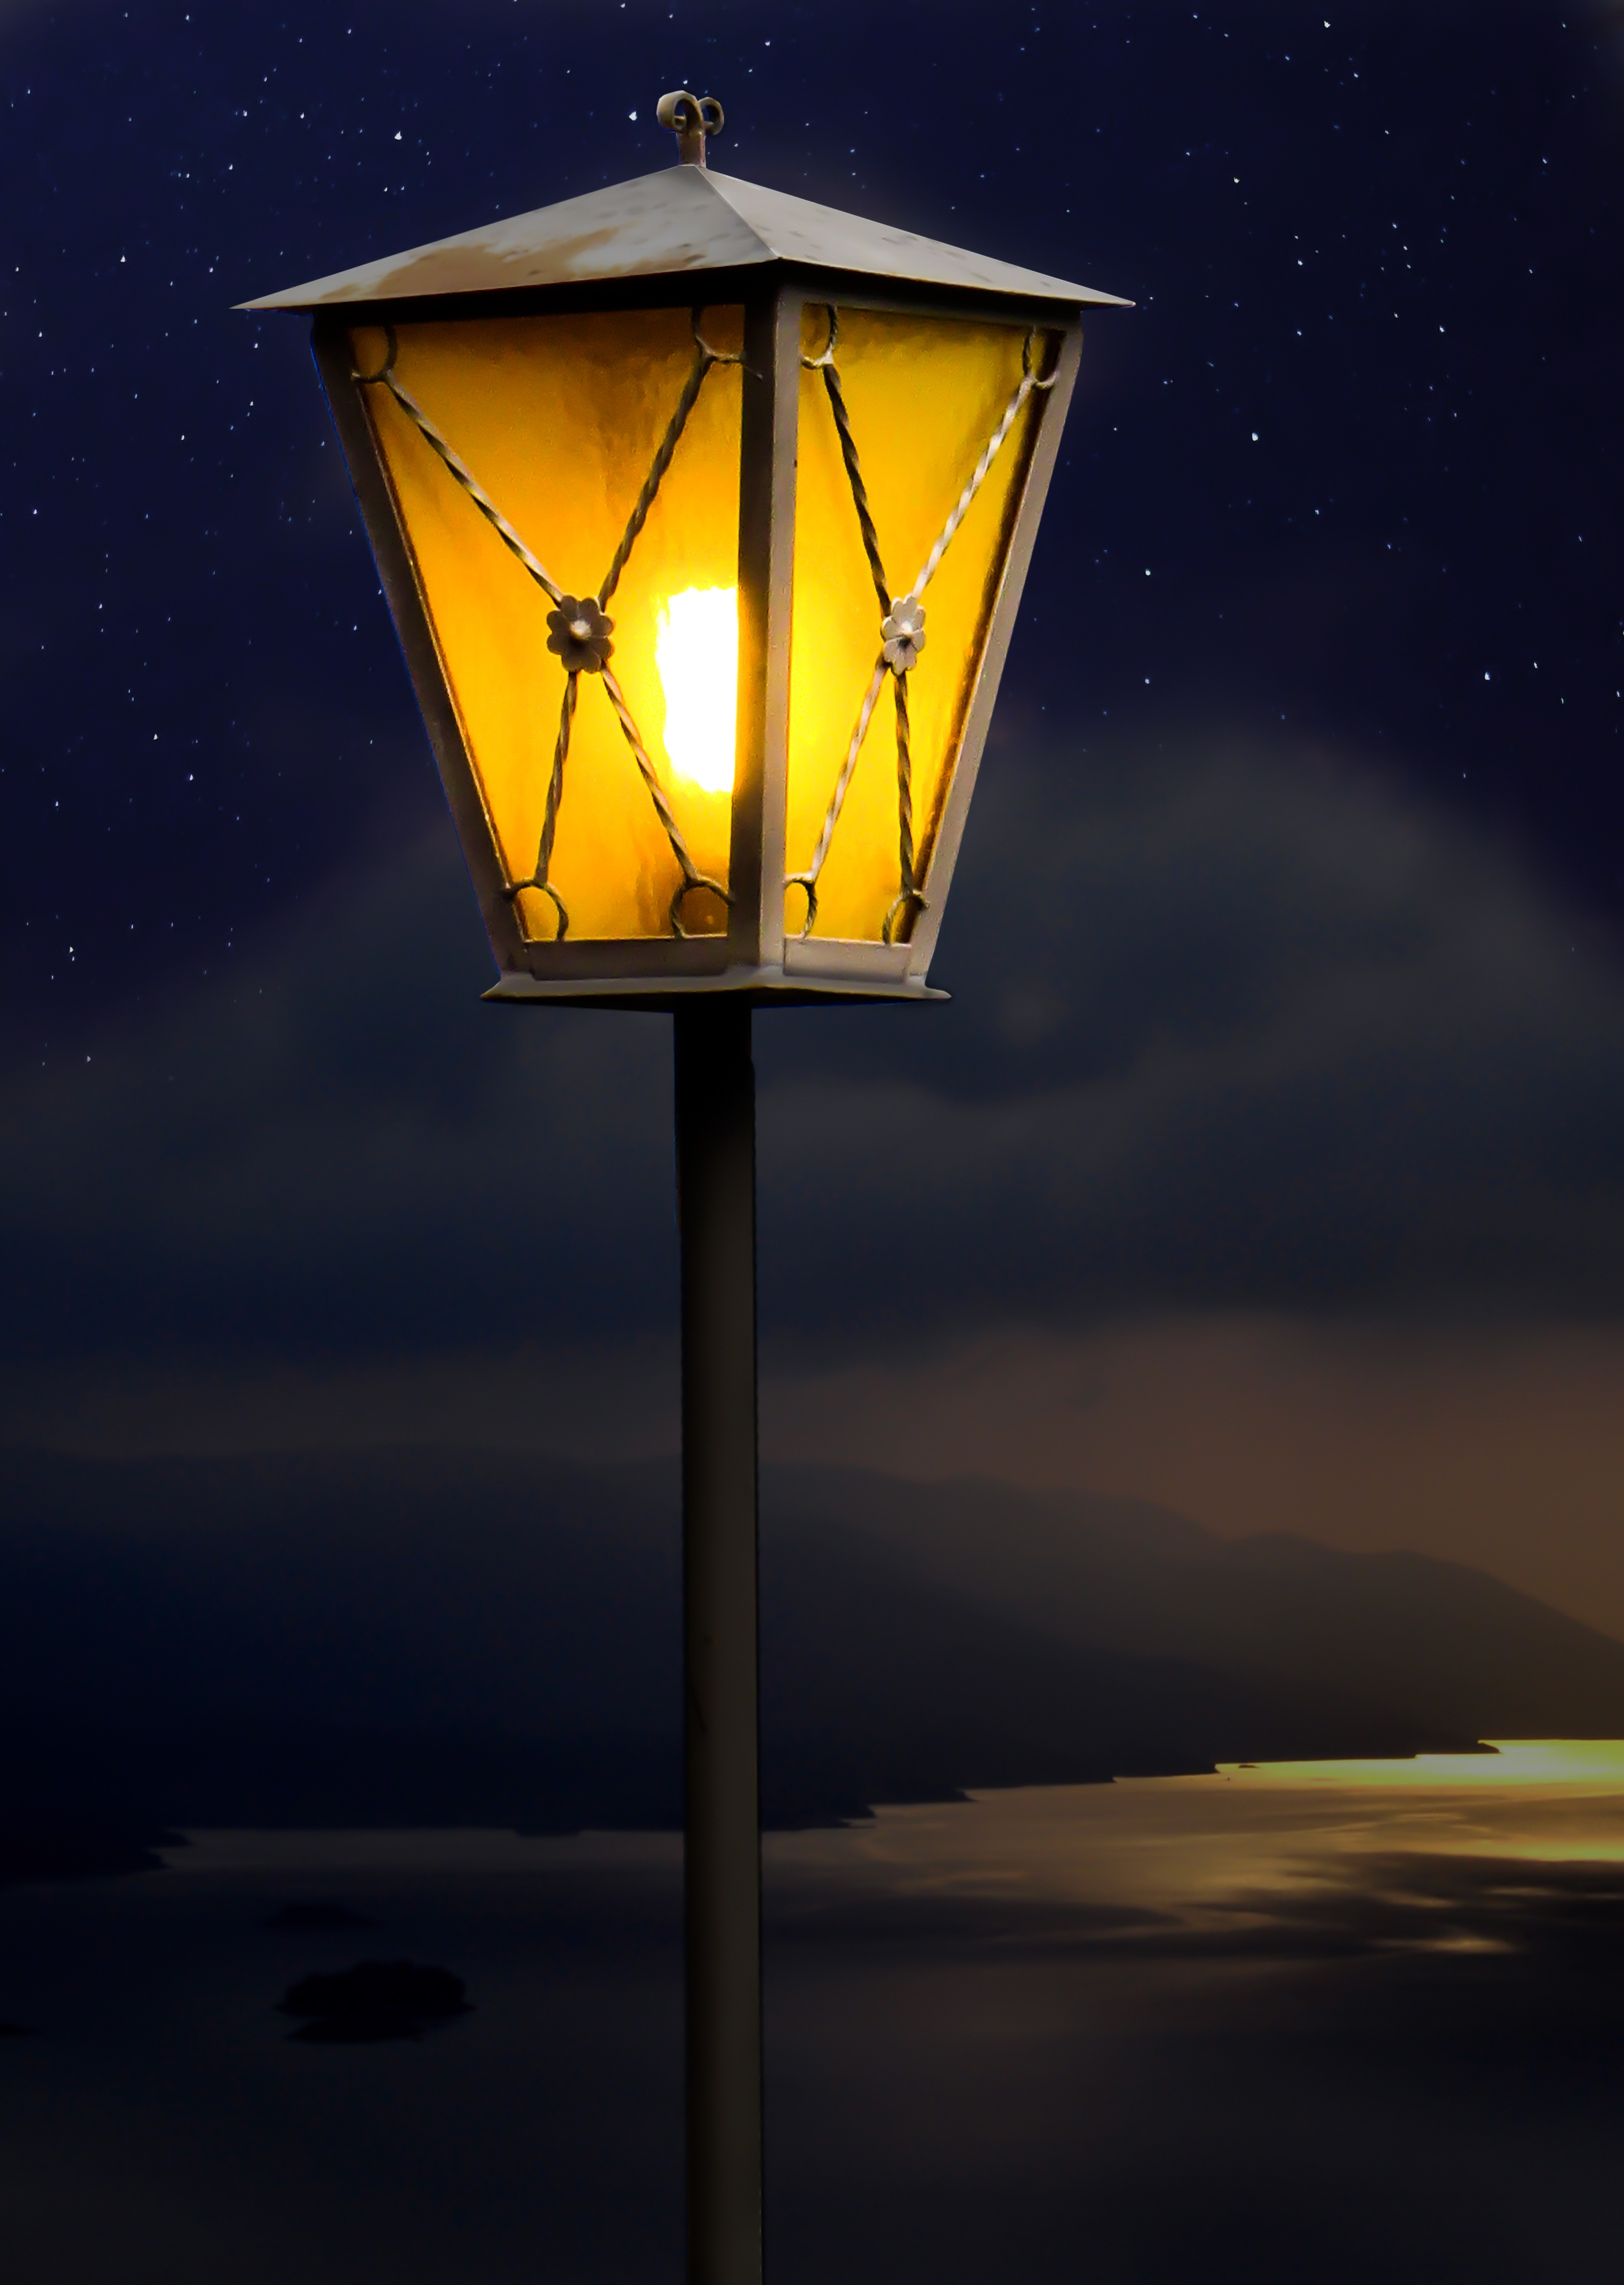 Street Lantern, Electronic, Lamp, Lantern, Light, HQ Photo